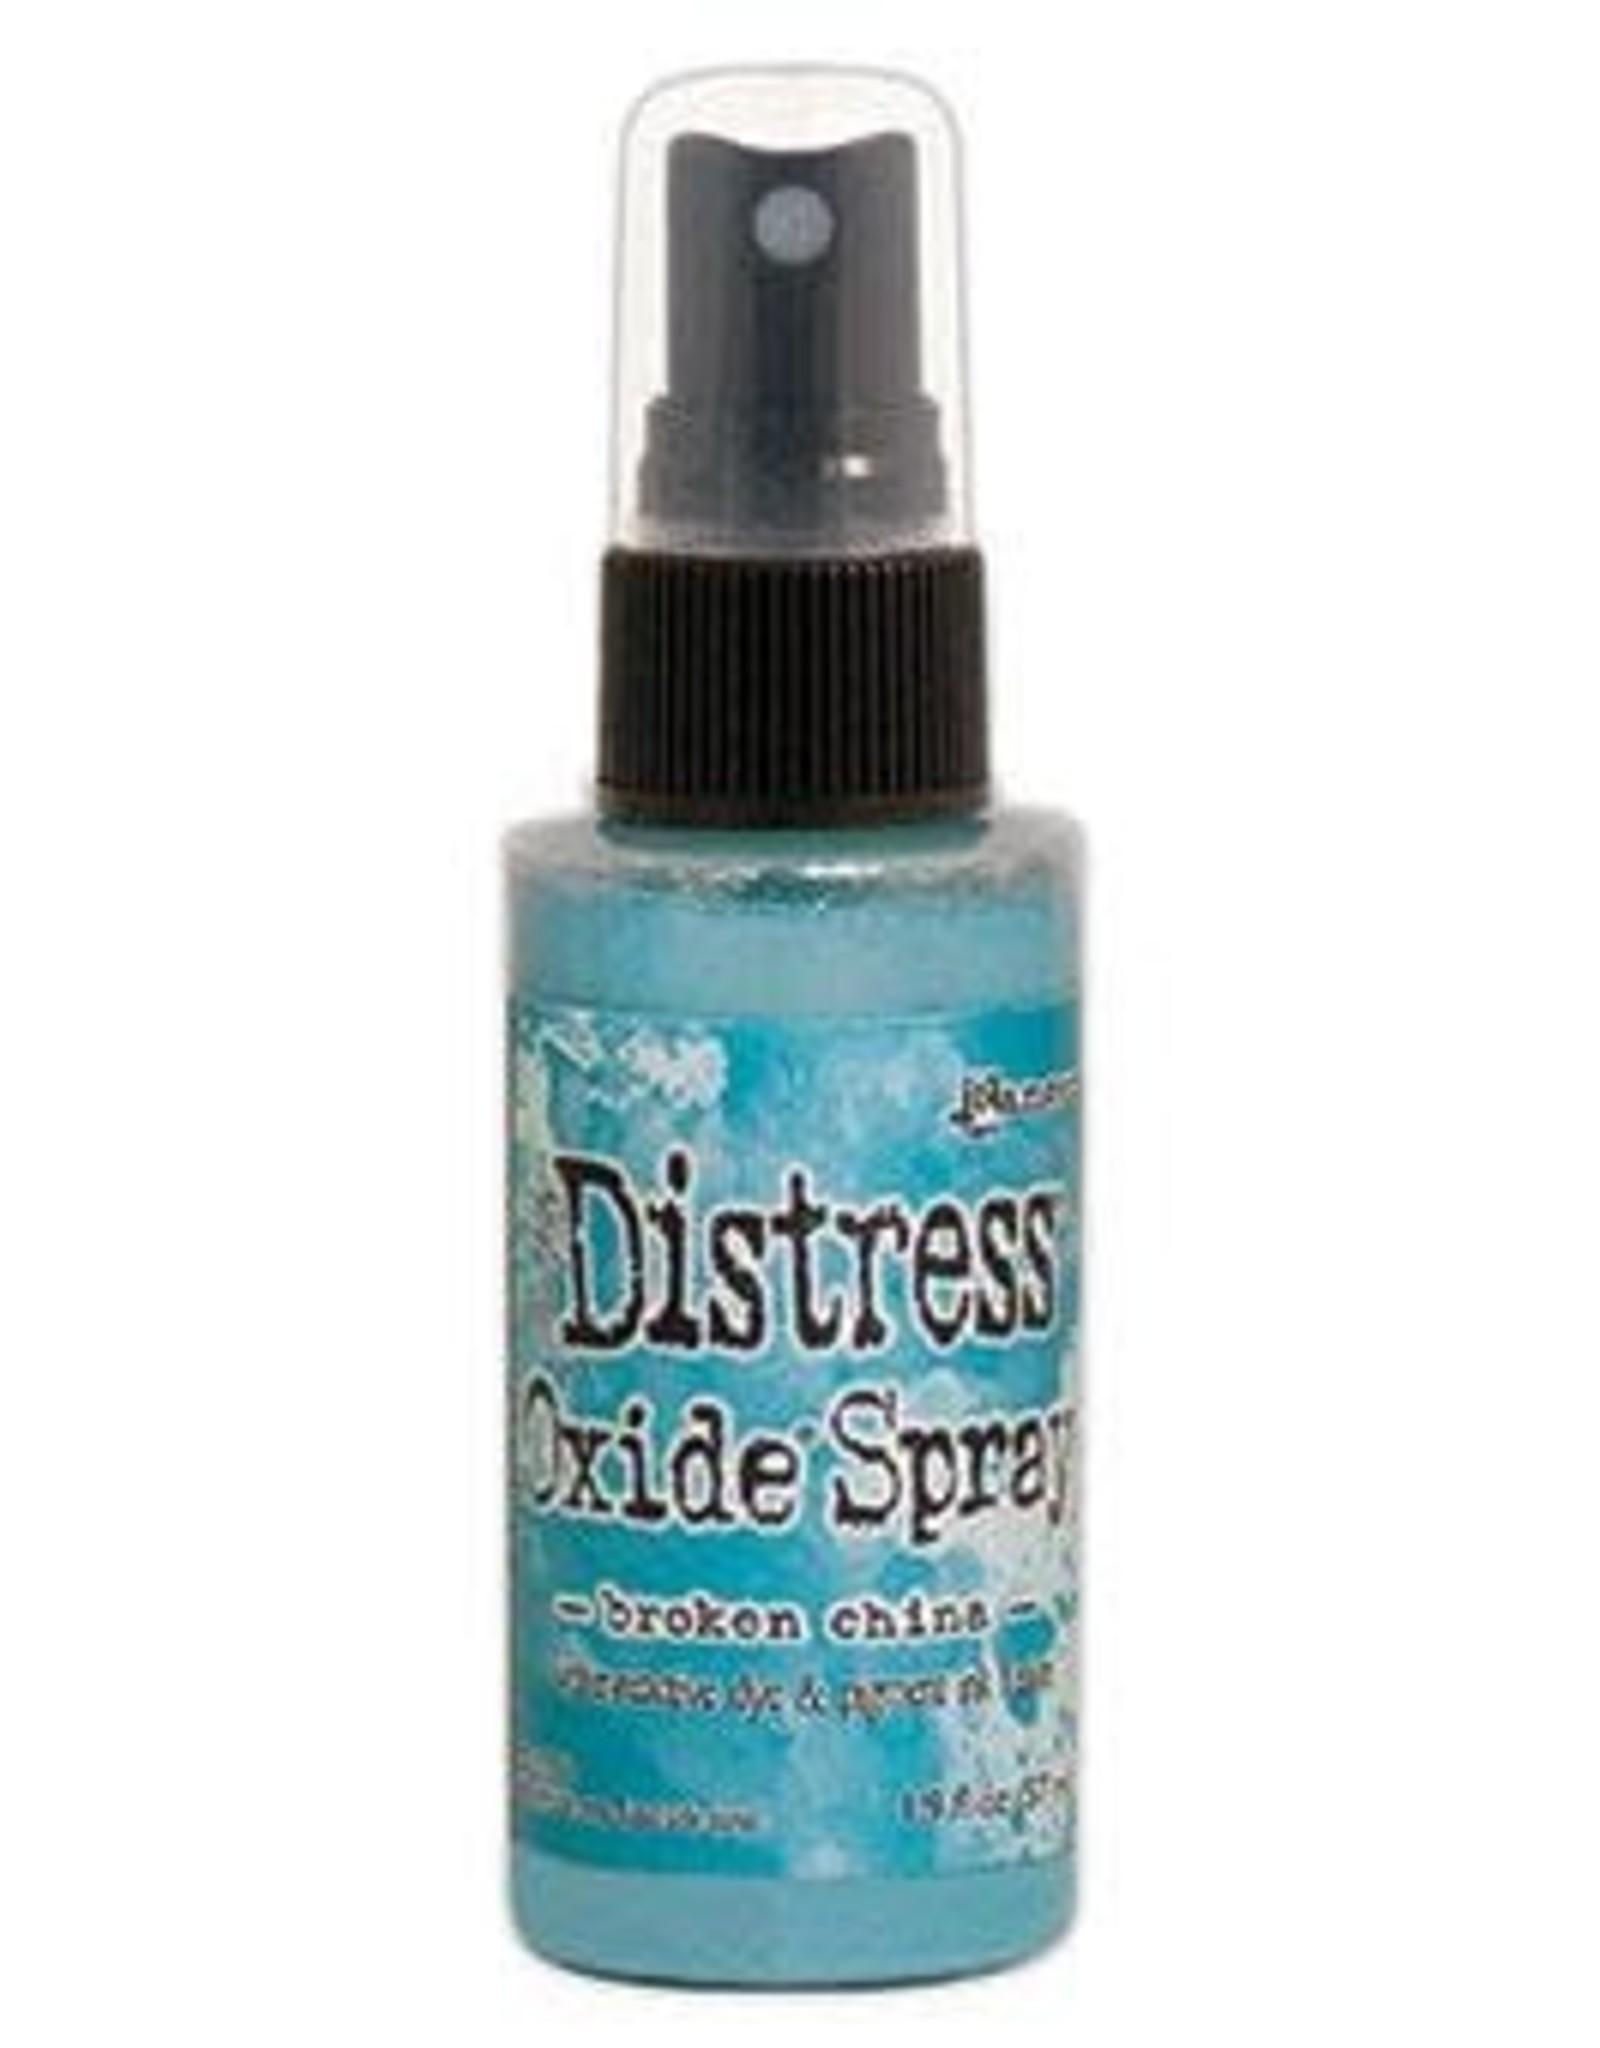 Tim Holtz Distress Oxide Spray, Broken China